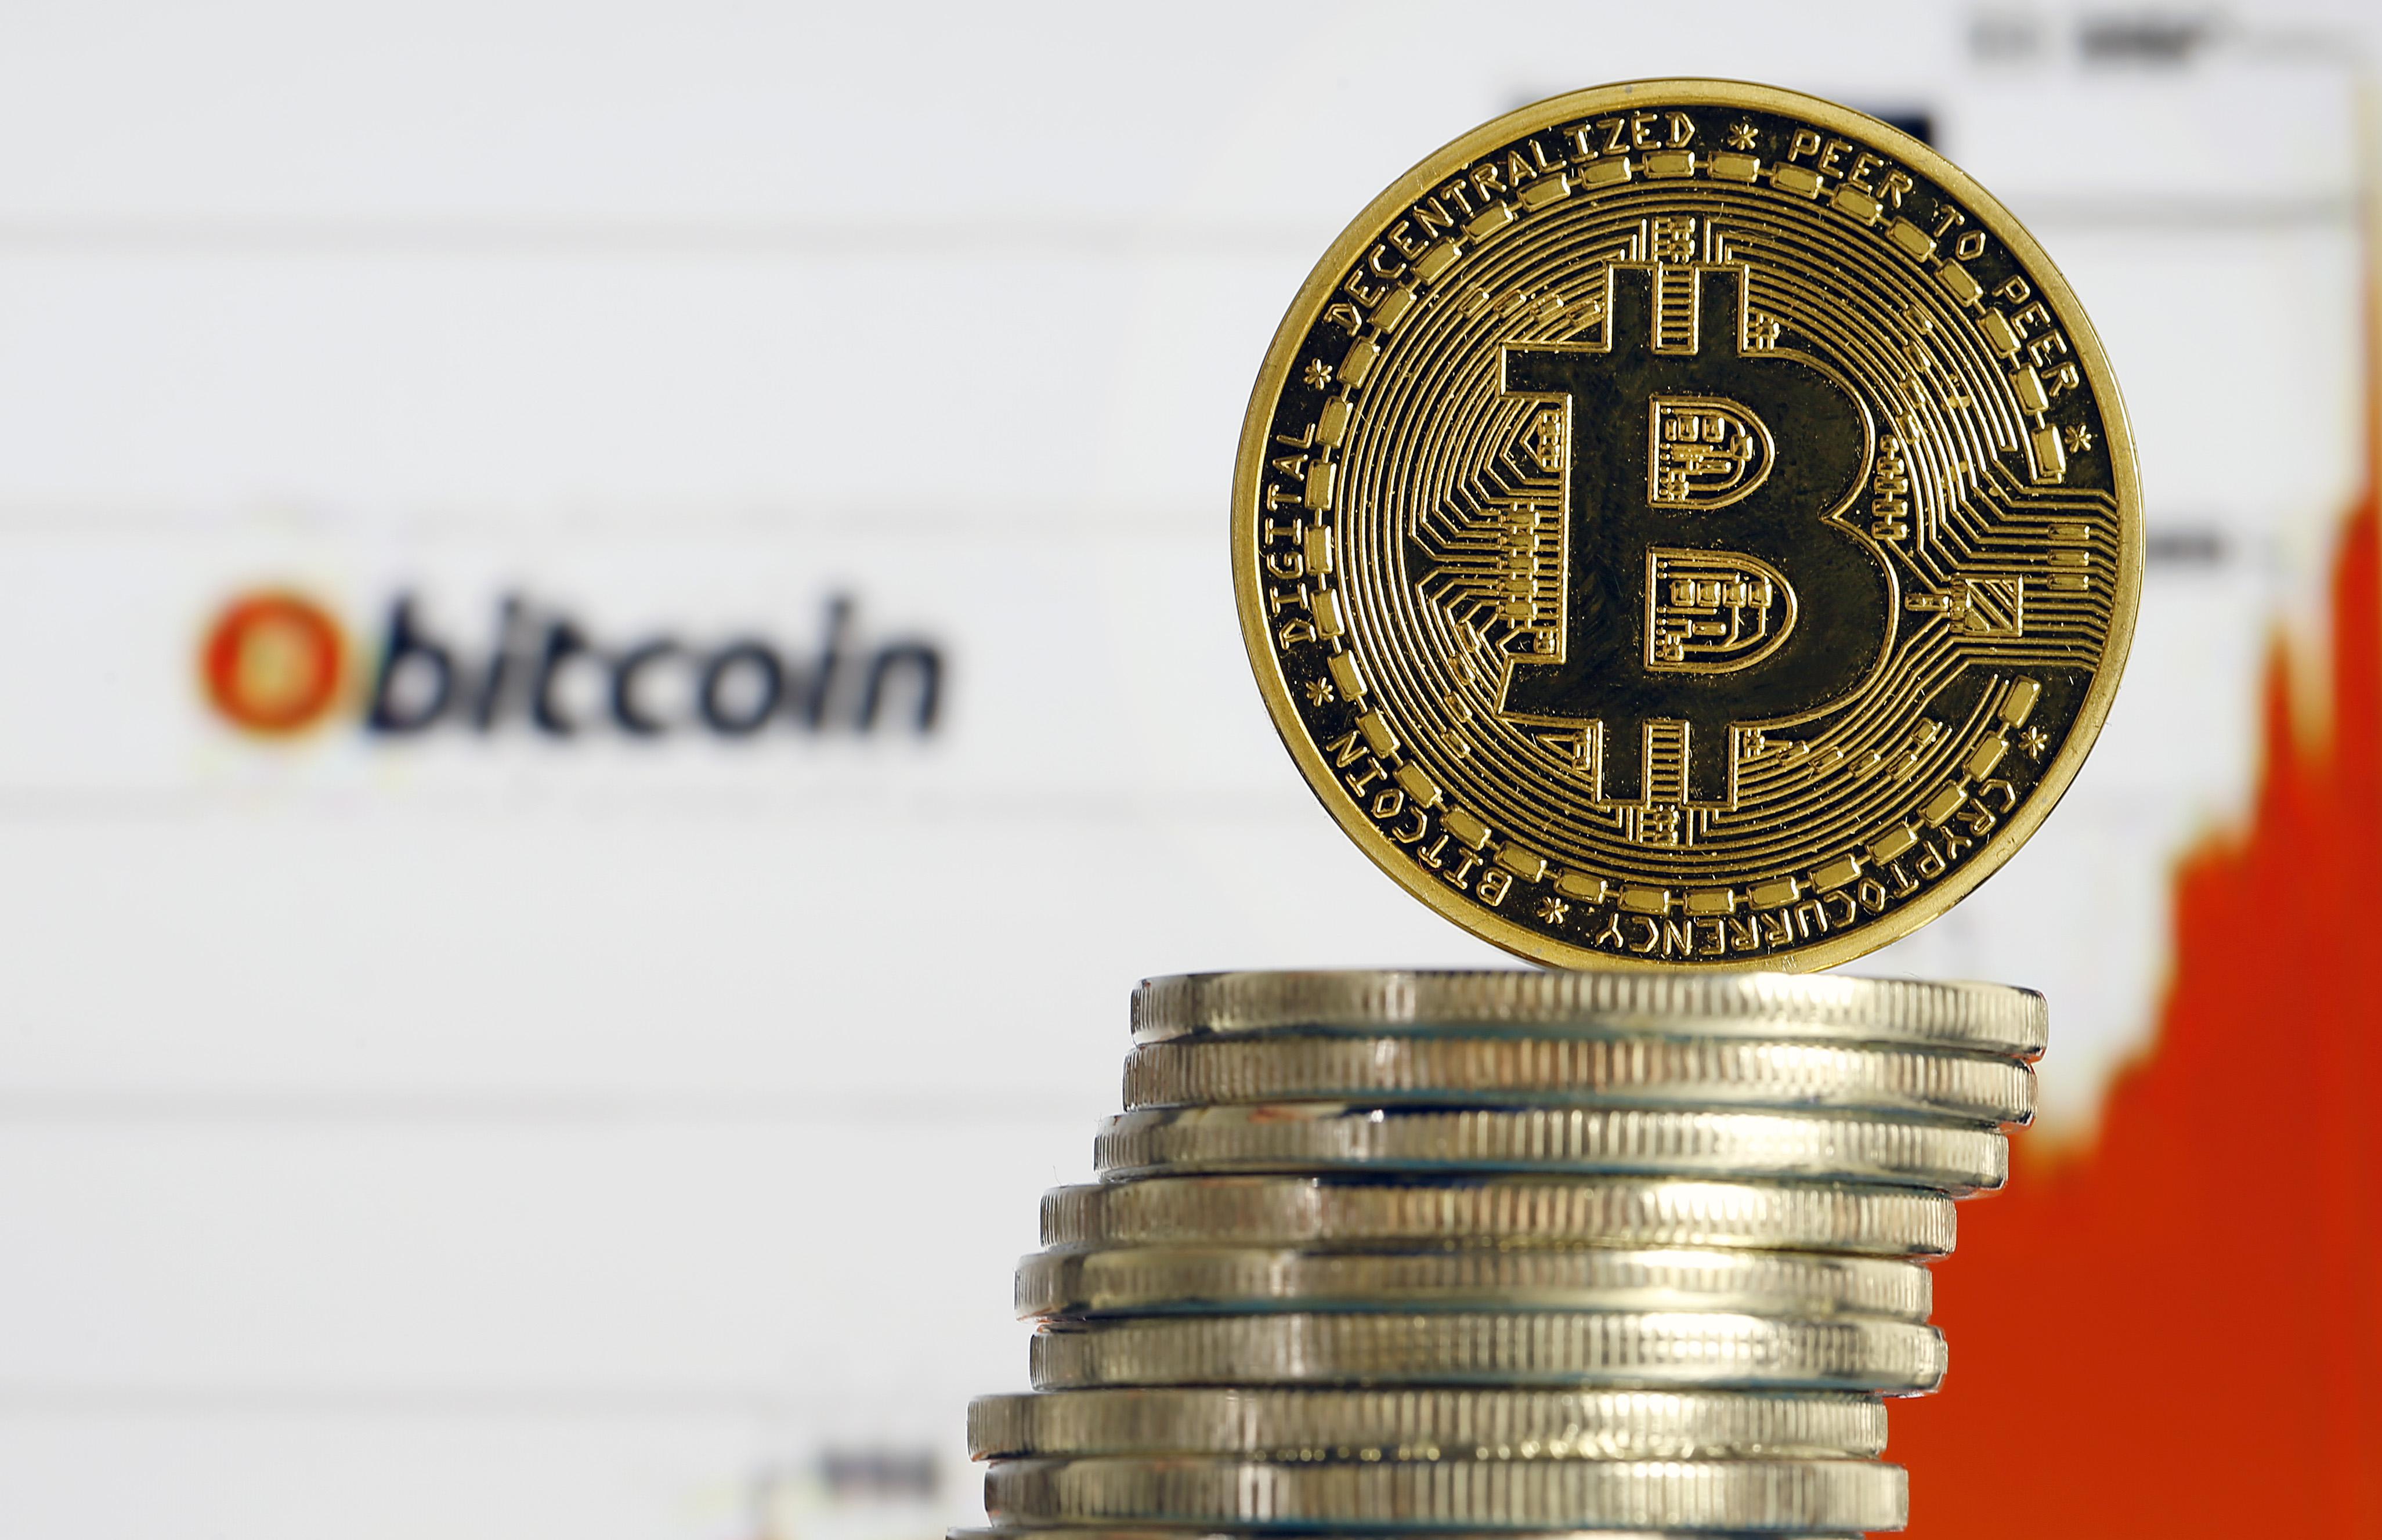 Bitcoin : Illustration In Paris